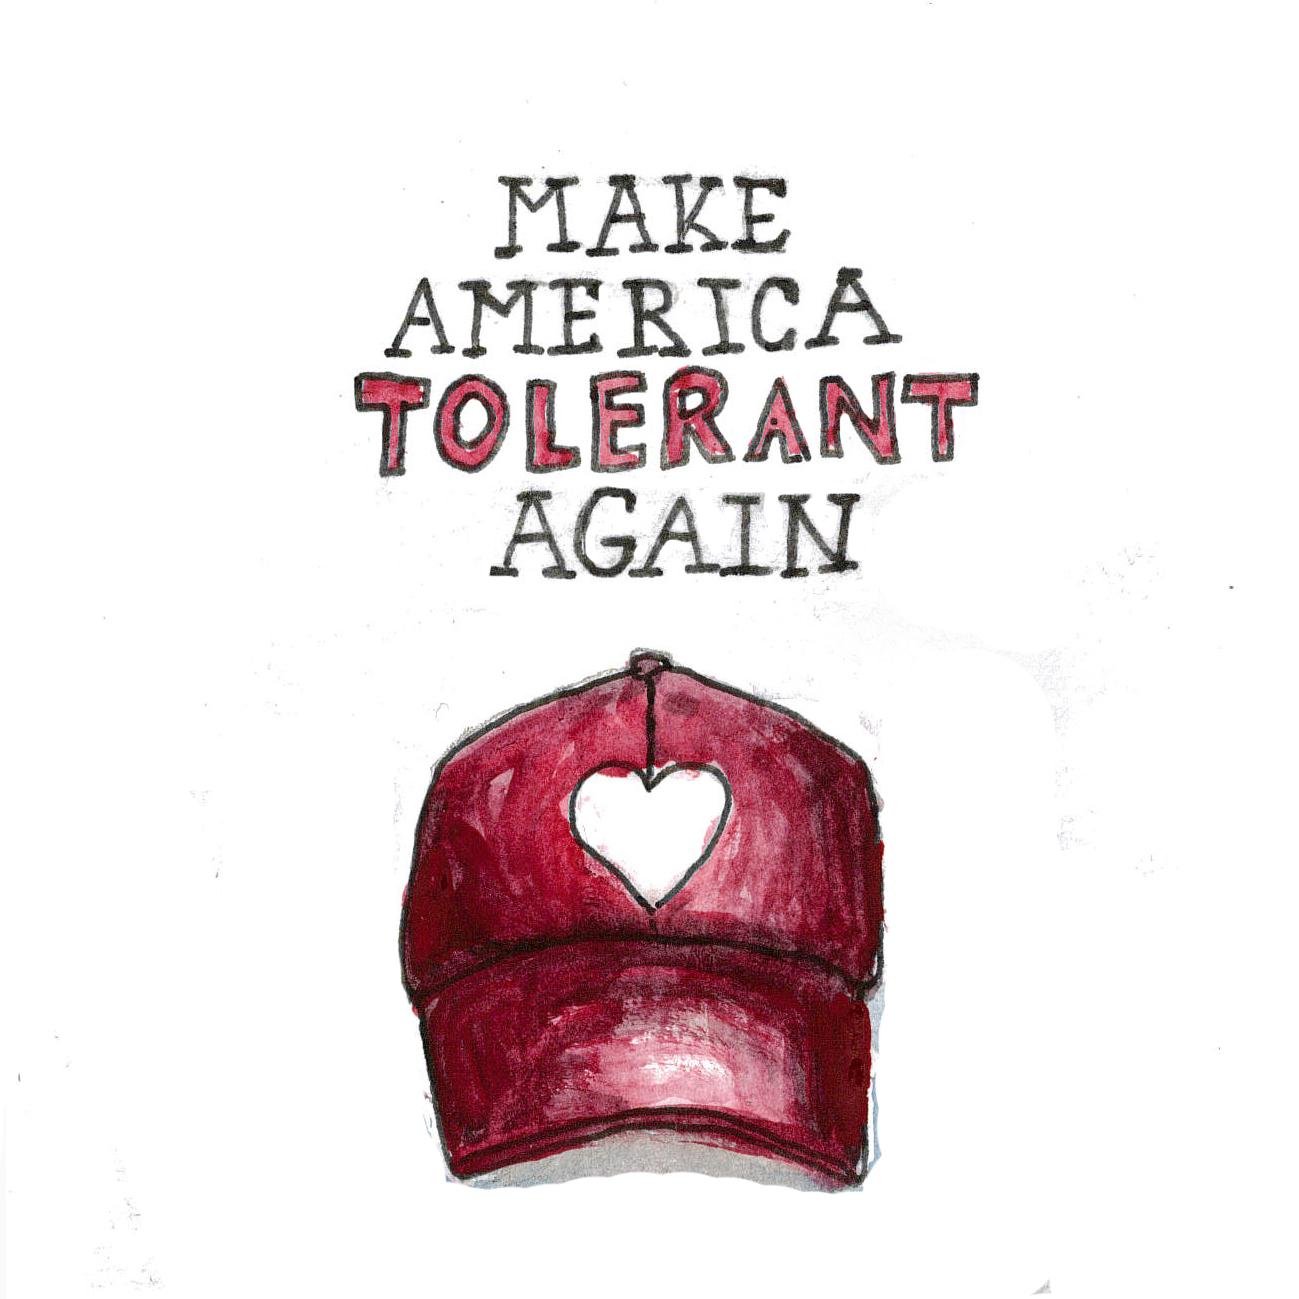 Make America Tolerant Again